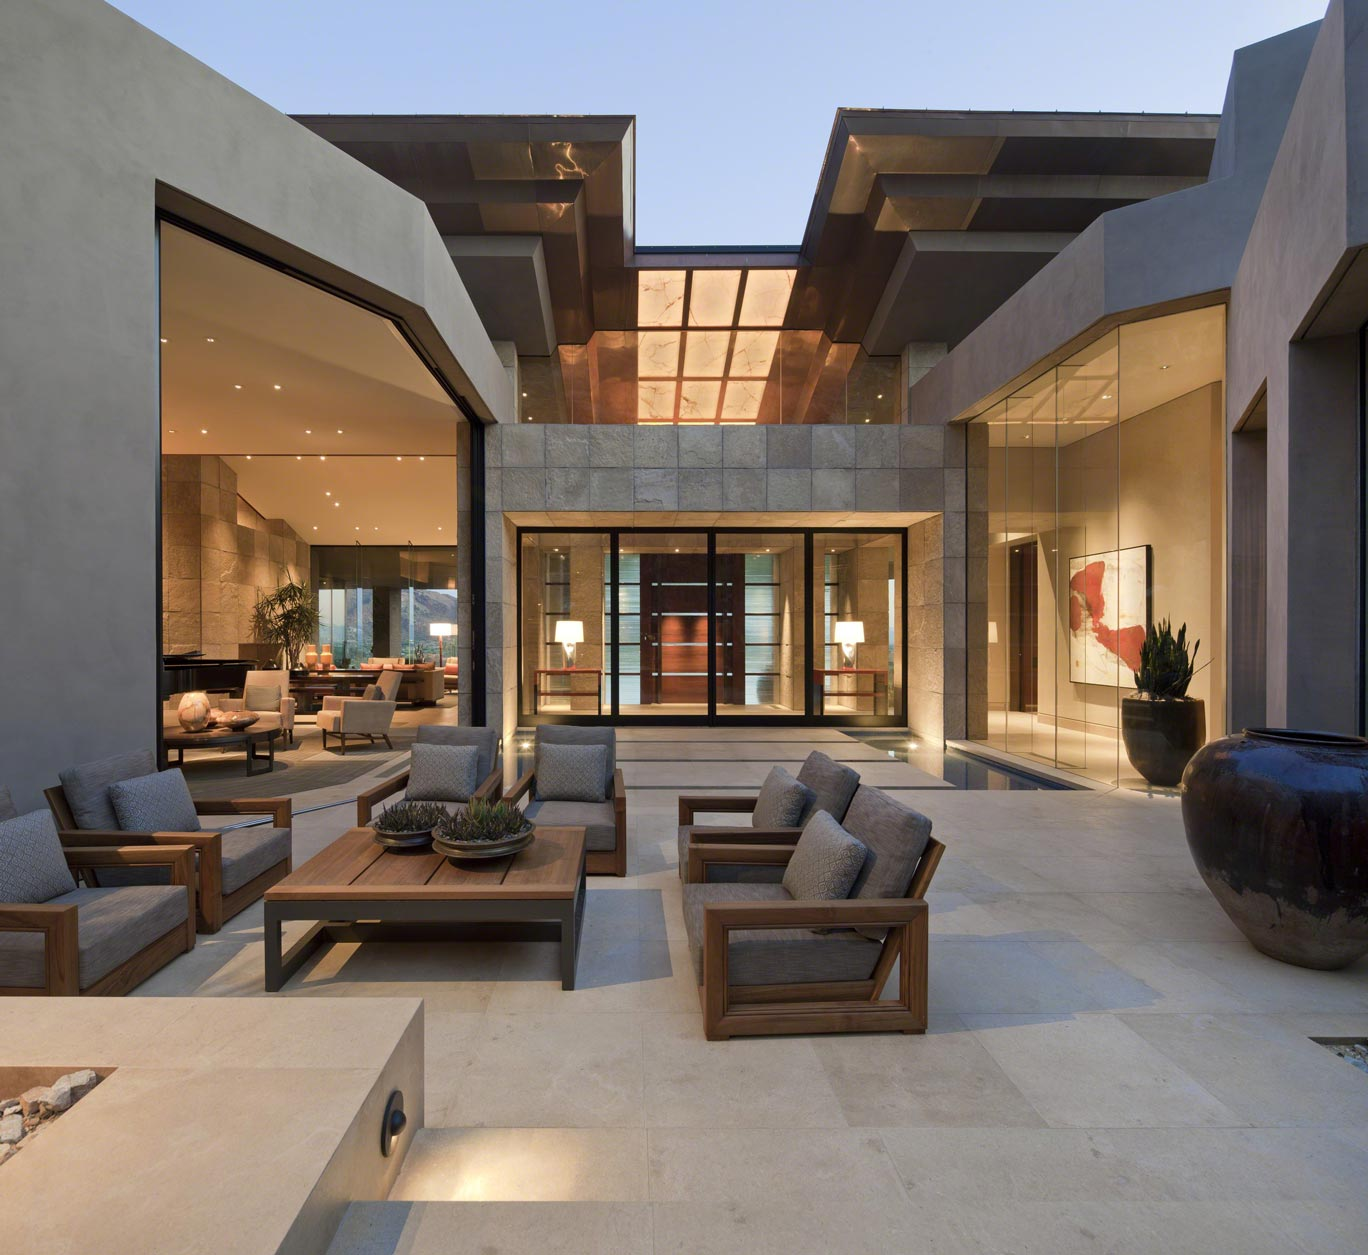 Contemporary outdoor living design in phoenix david michael miller for Modern showroom exterior design